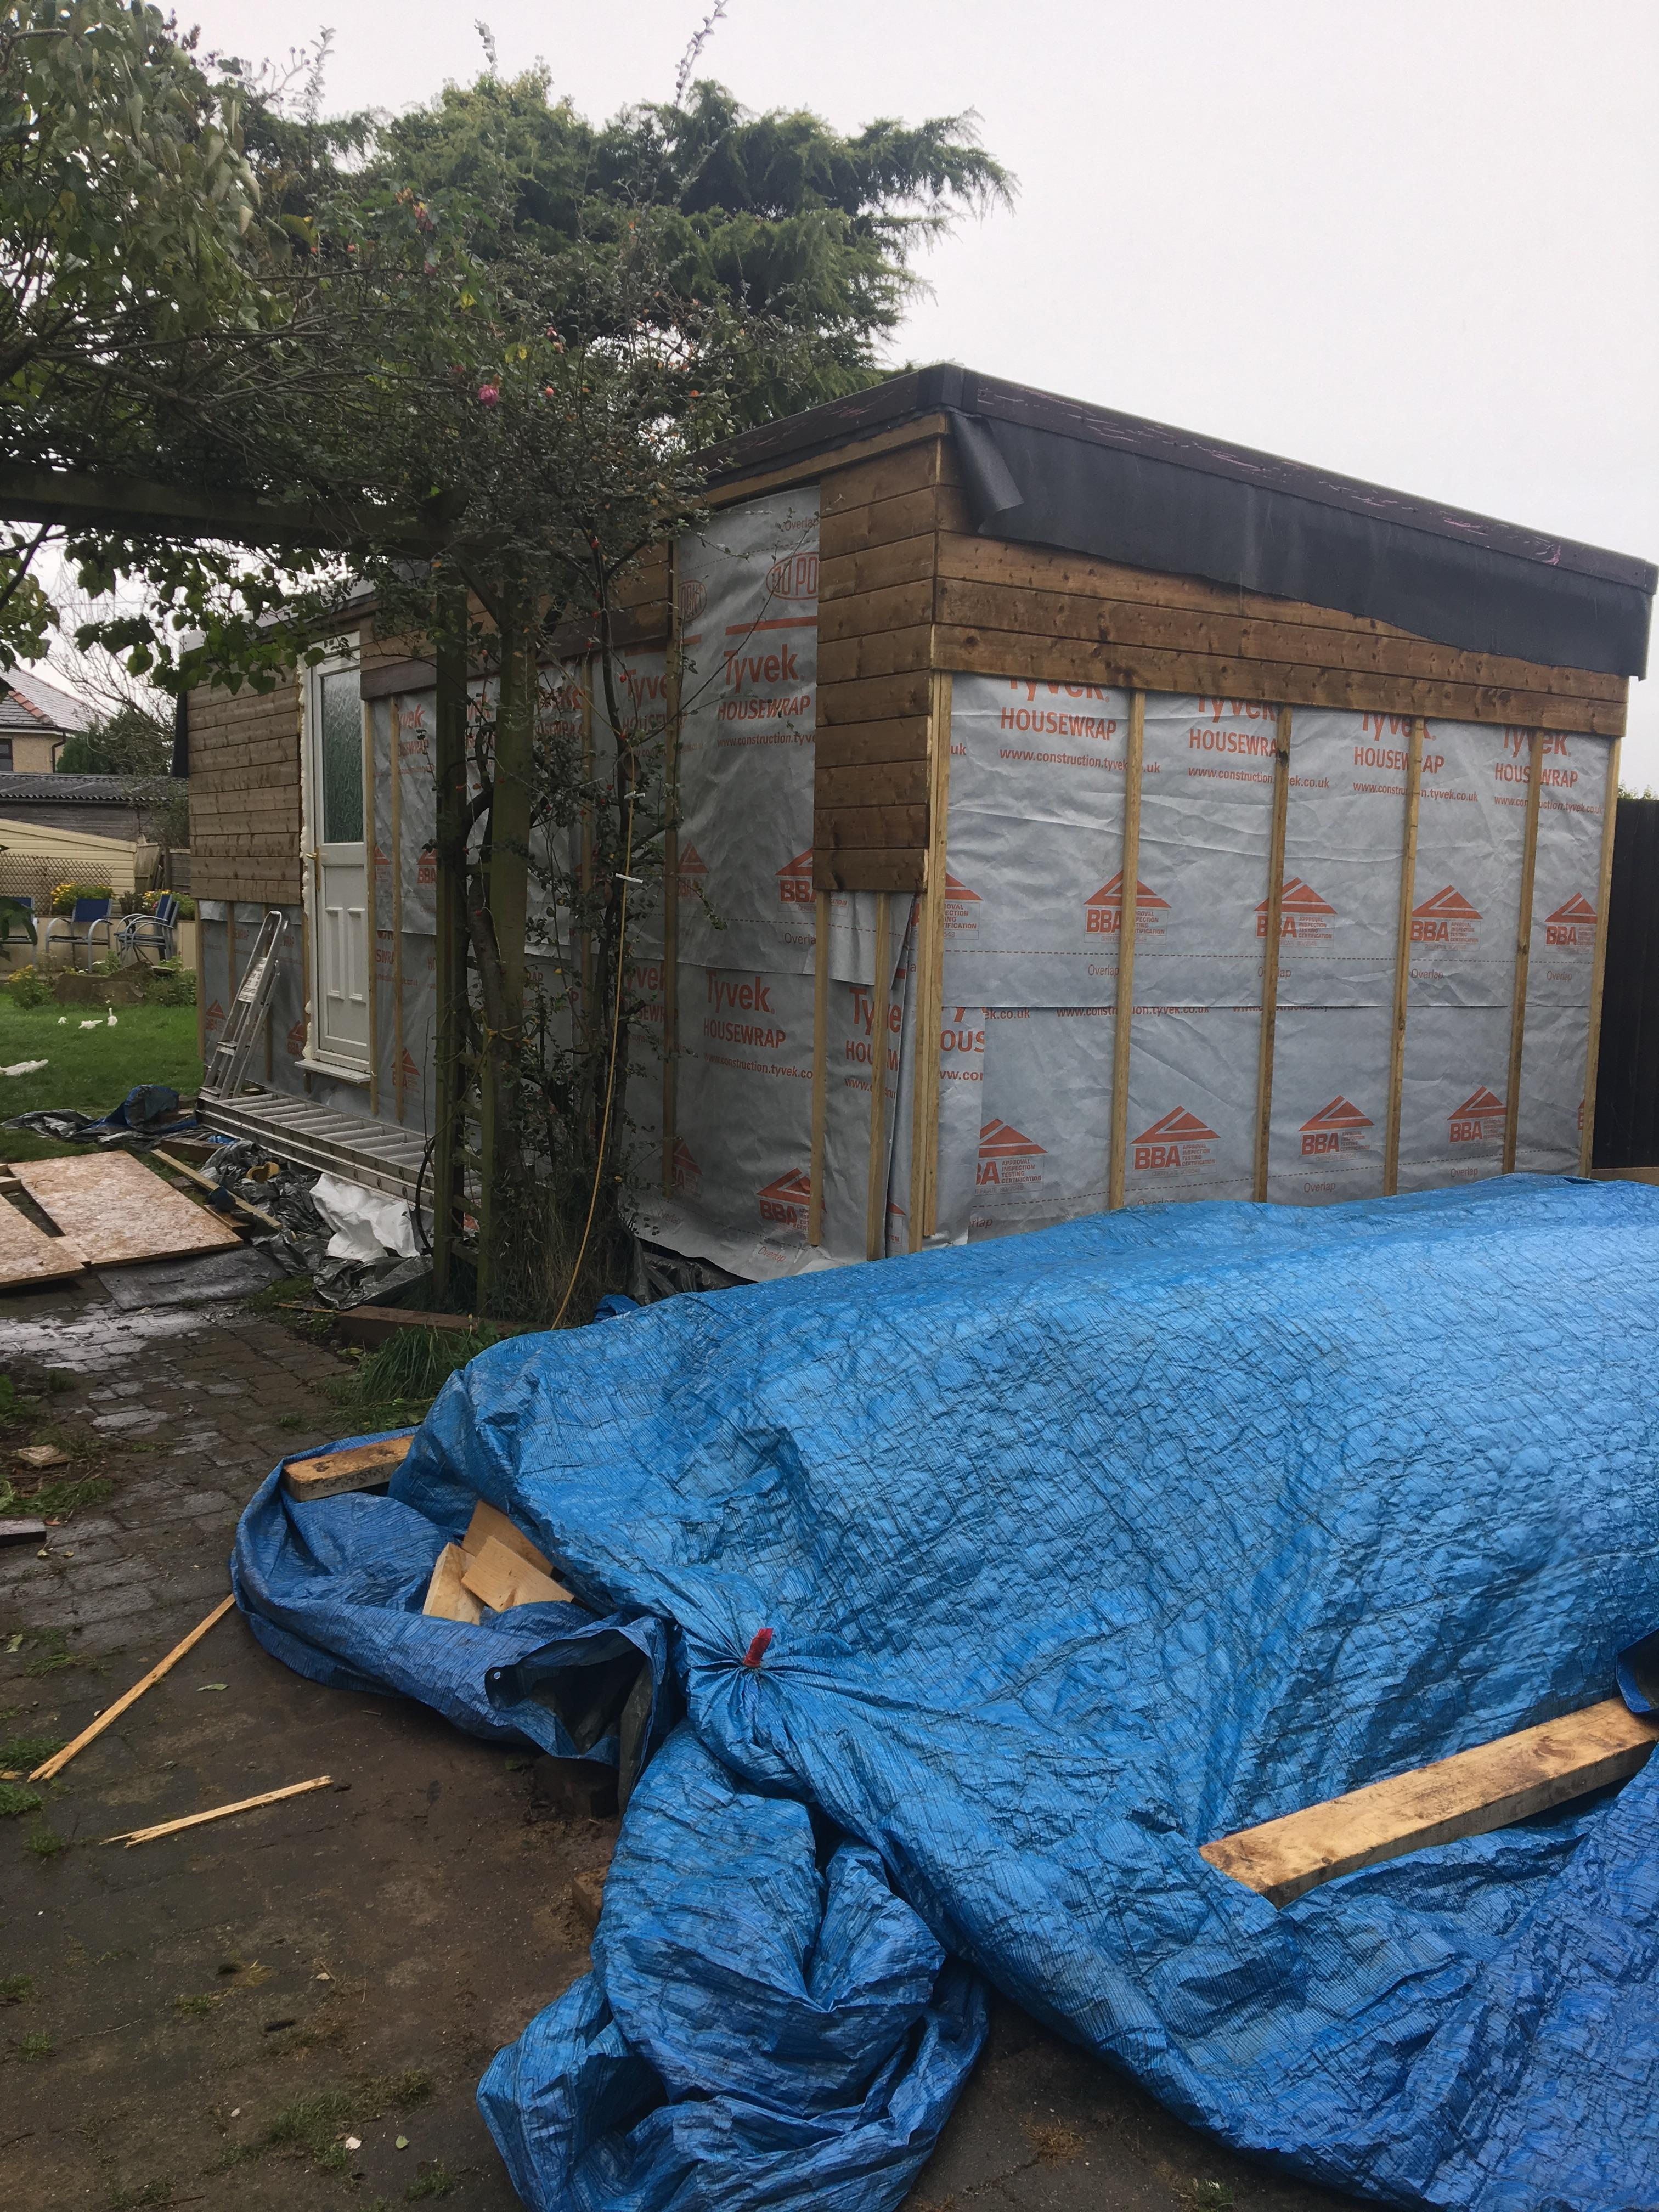 Reptile shed project-934faa02-b11b-4771-aef7-7587acf87df3_1558681547341.jpeg